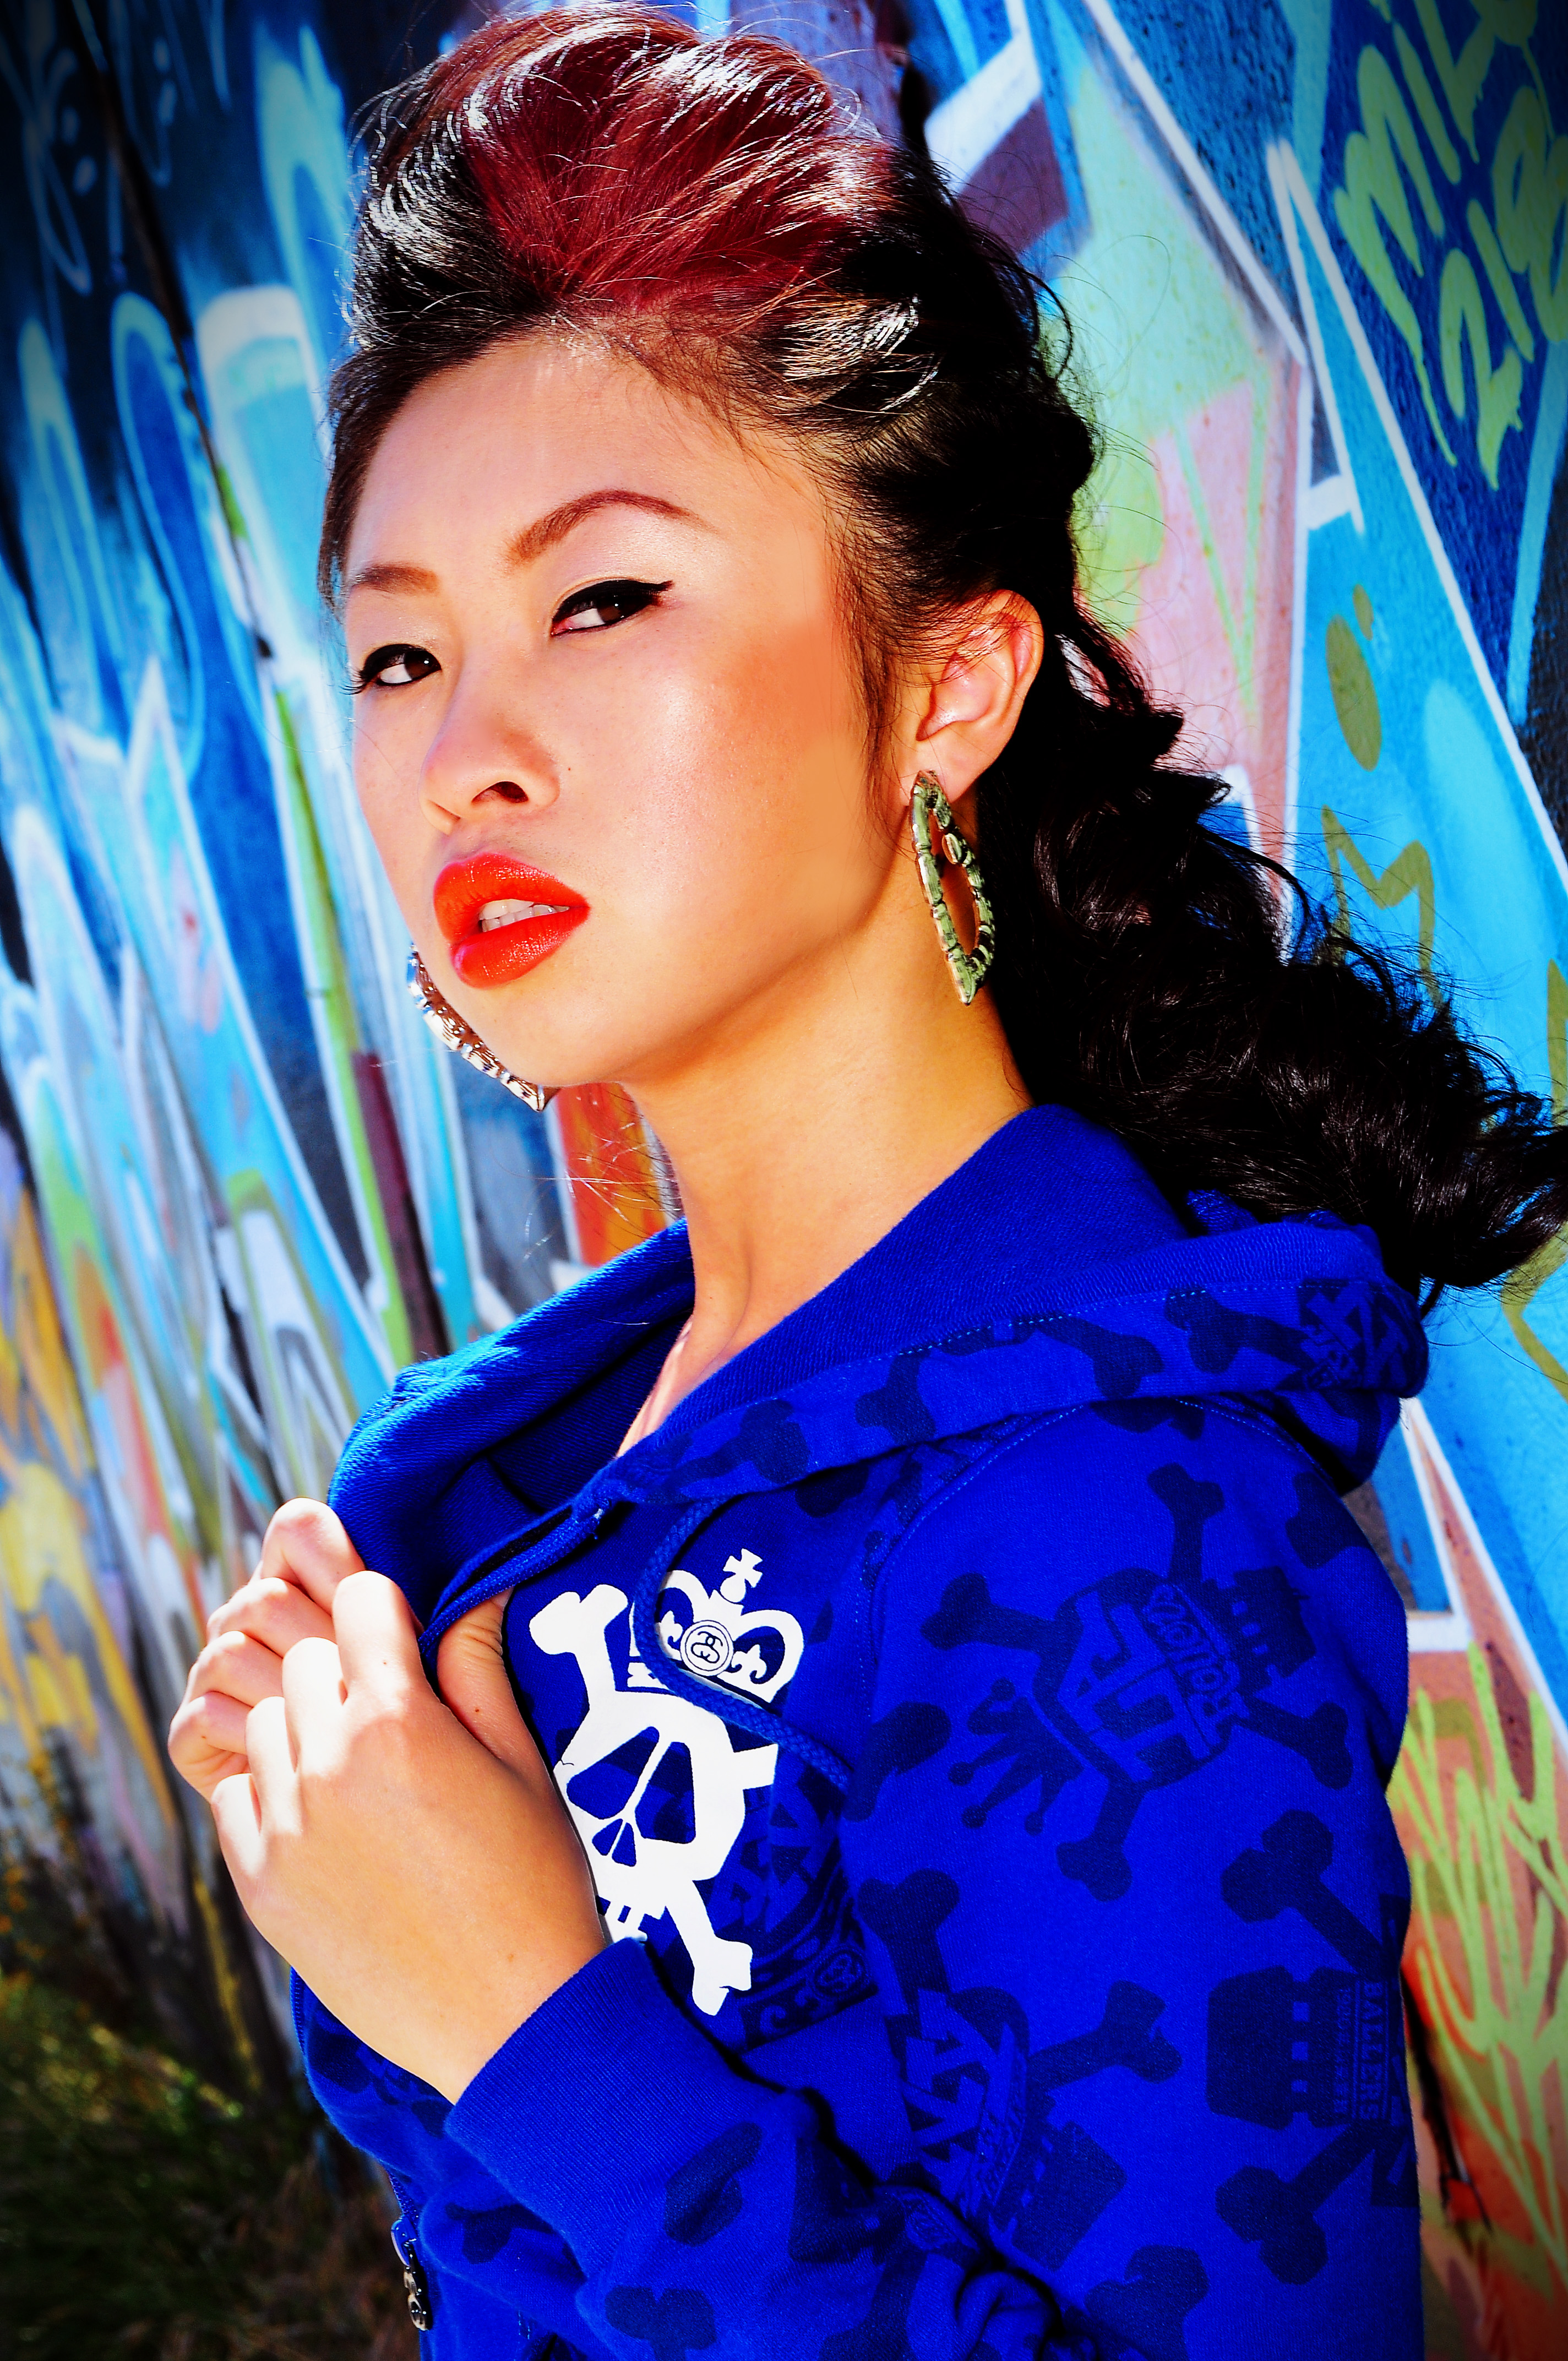 san diego modeling portraits, graffiti art modeling, san diego portraits